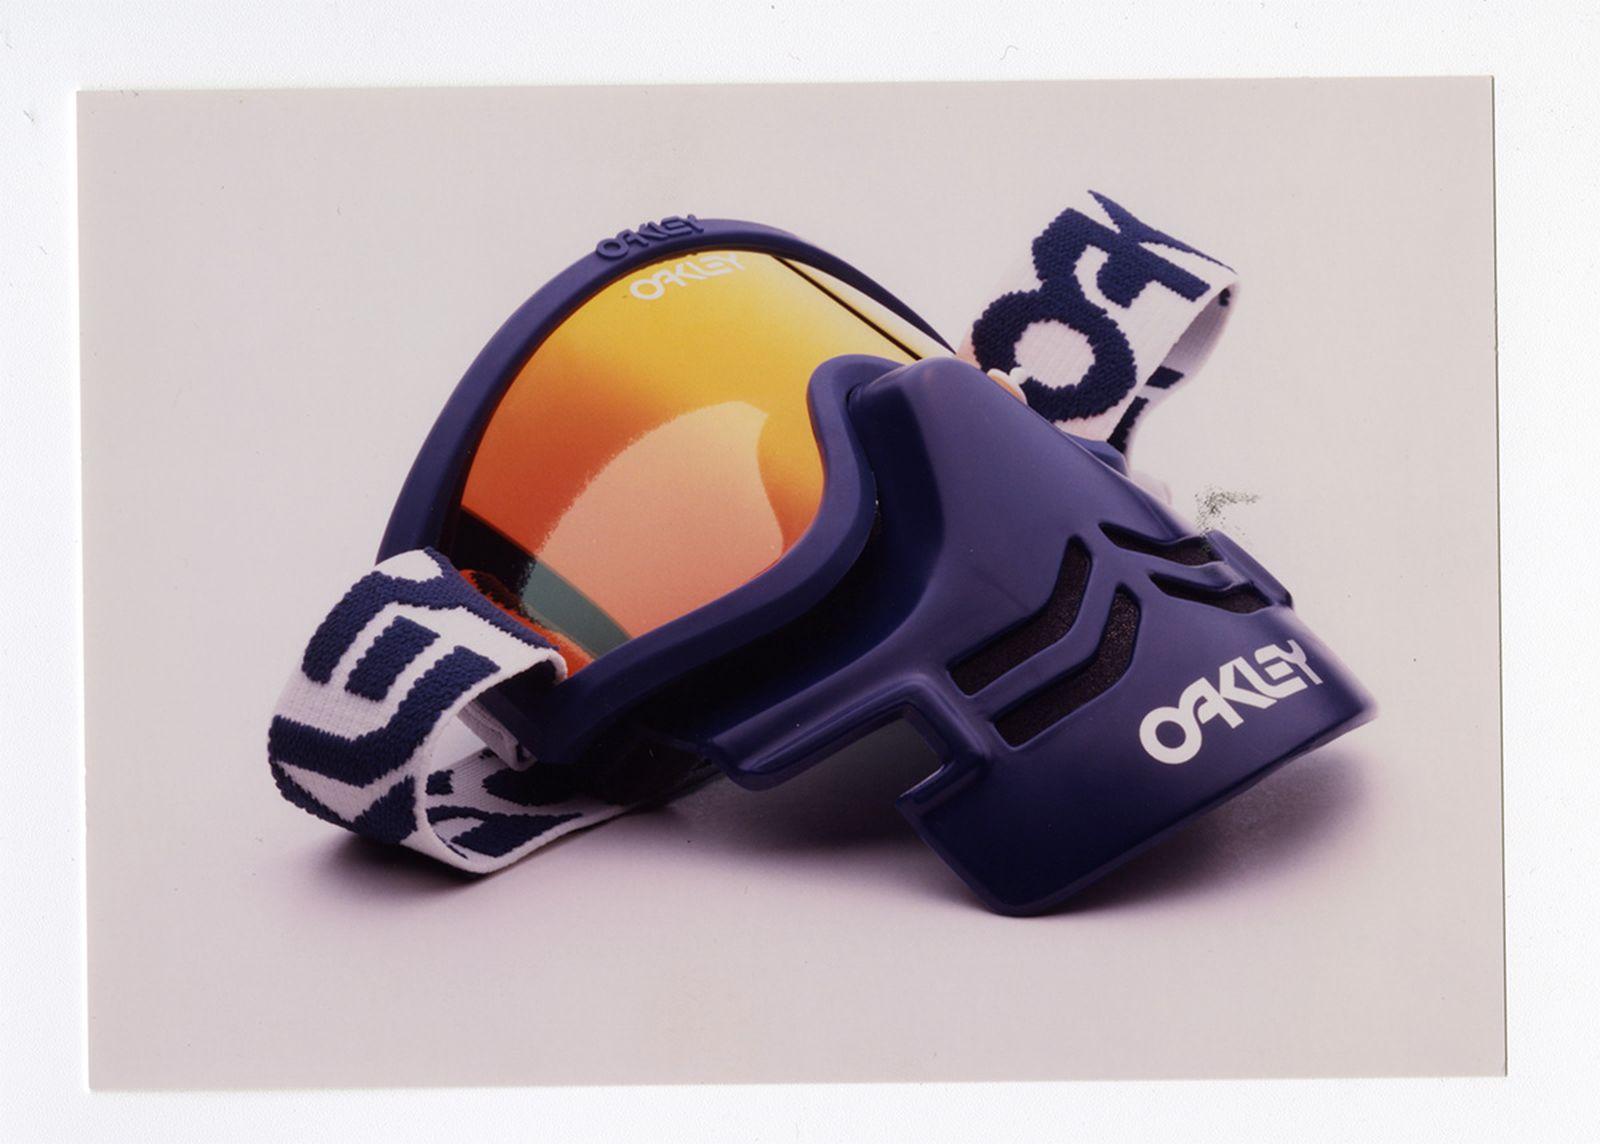 historique-clarté-oakleys-lens-tech-keeps-get-sharper-13